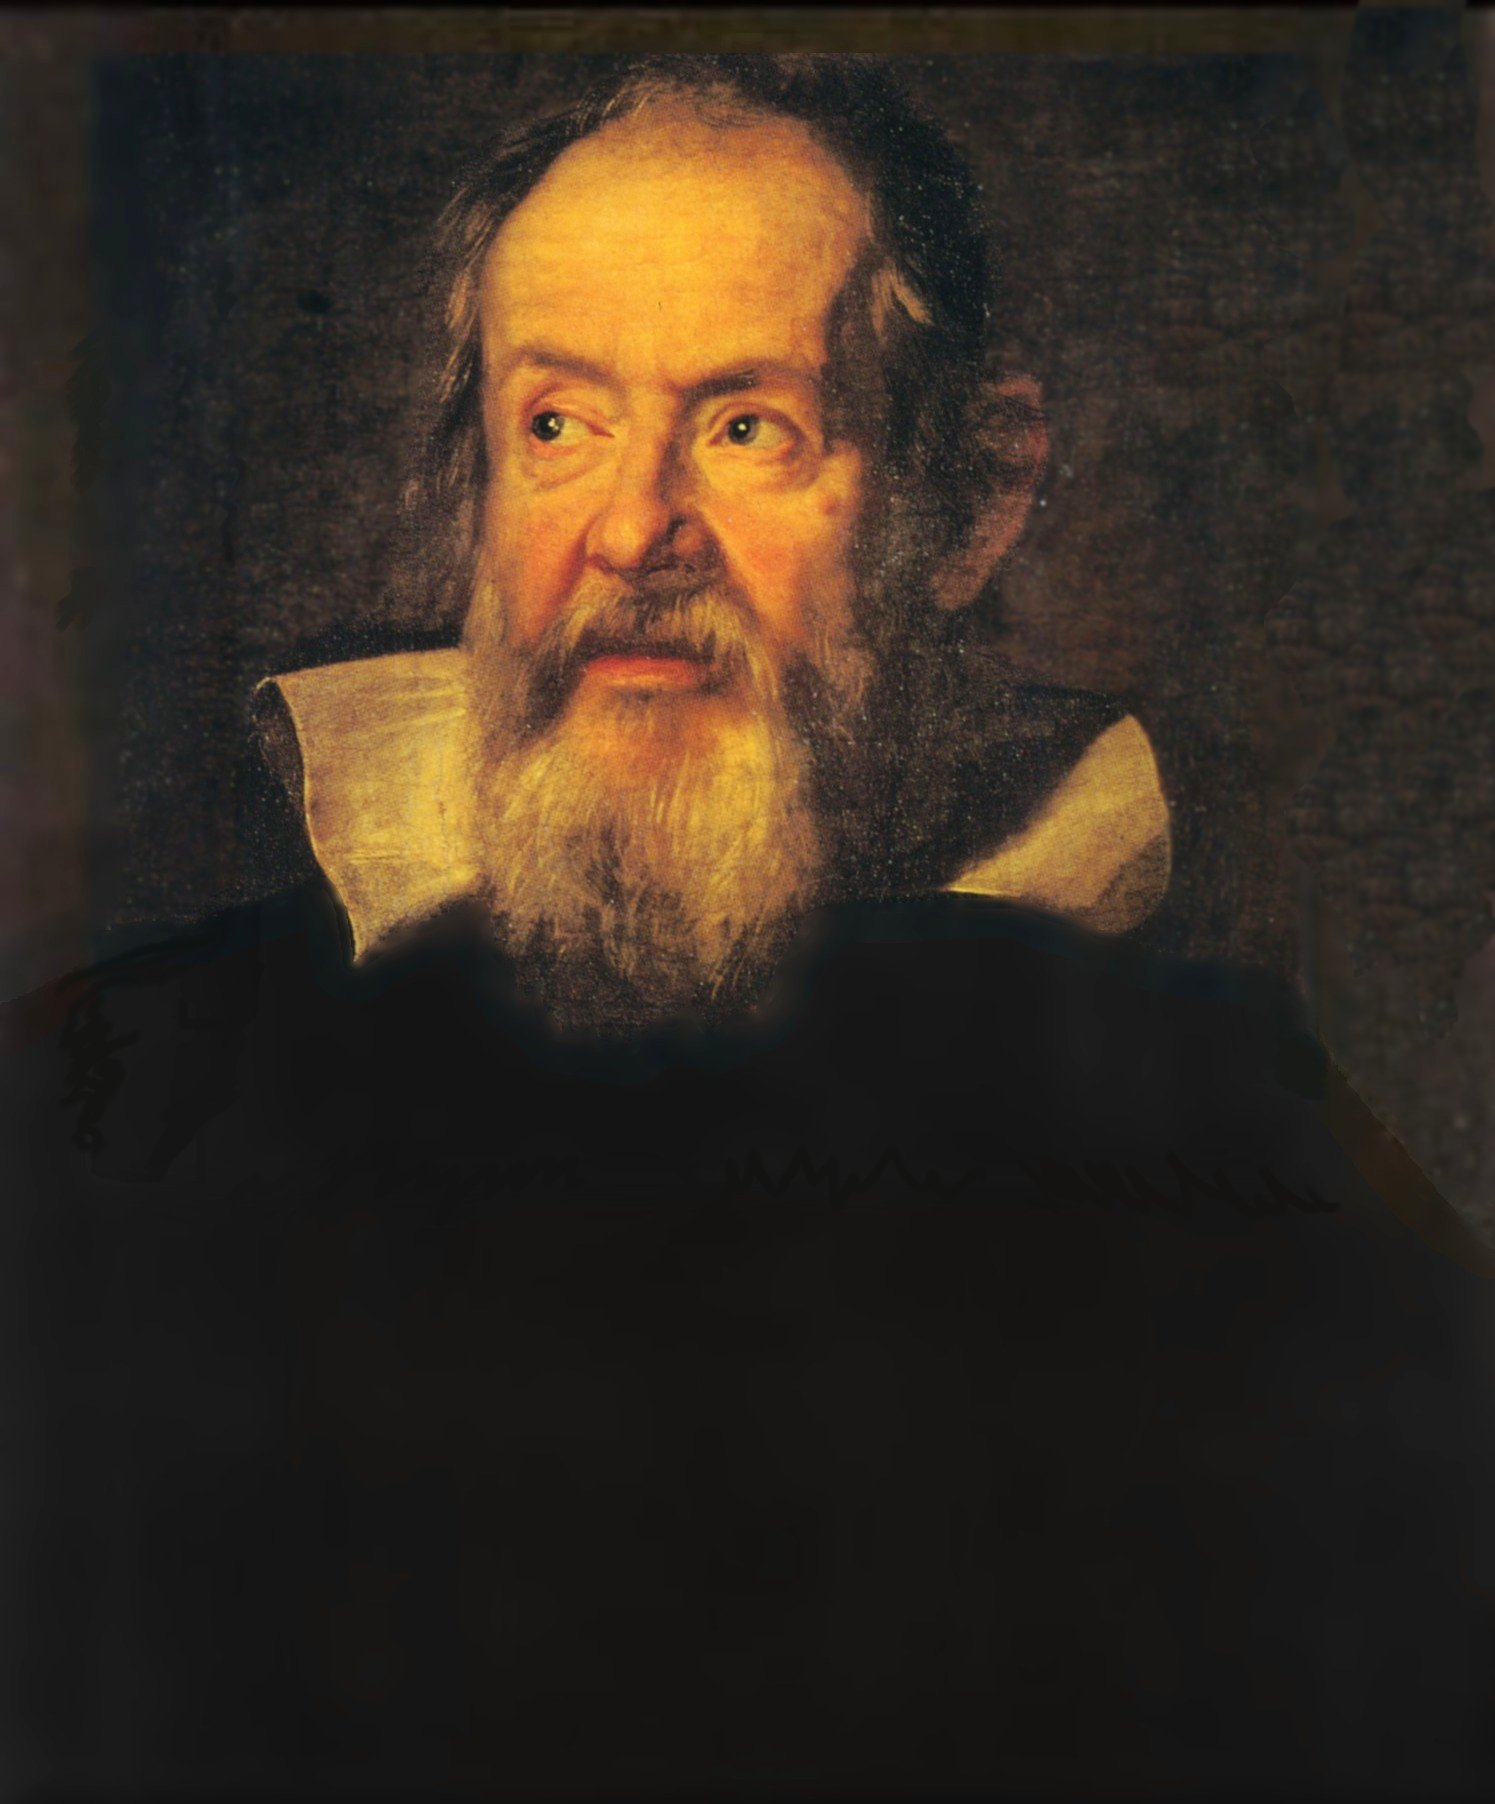 RIP Galileo